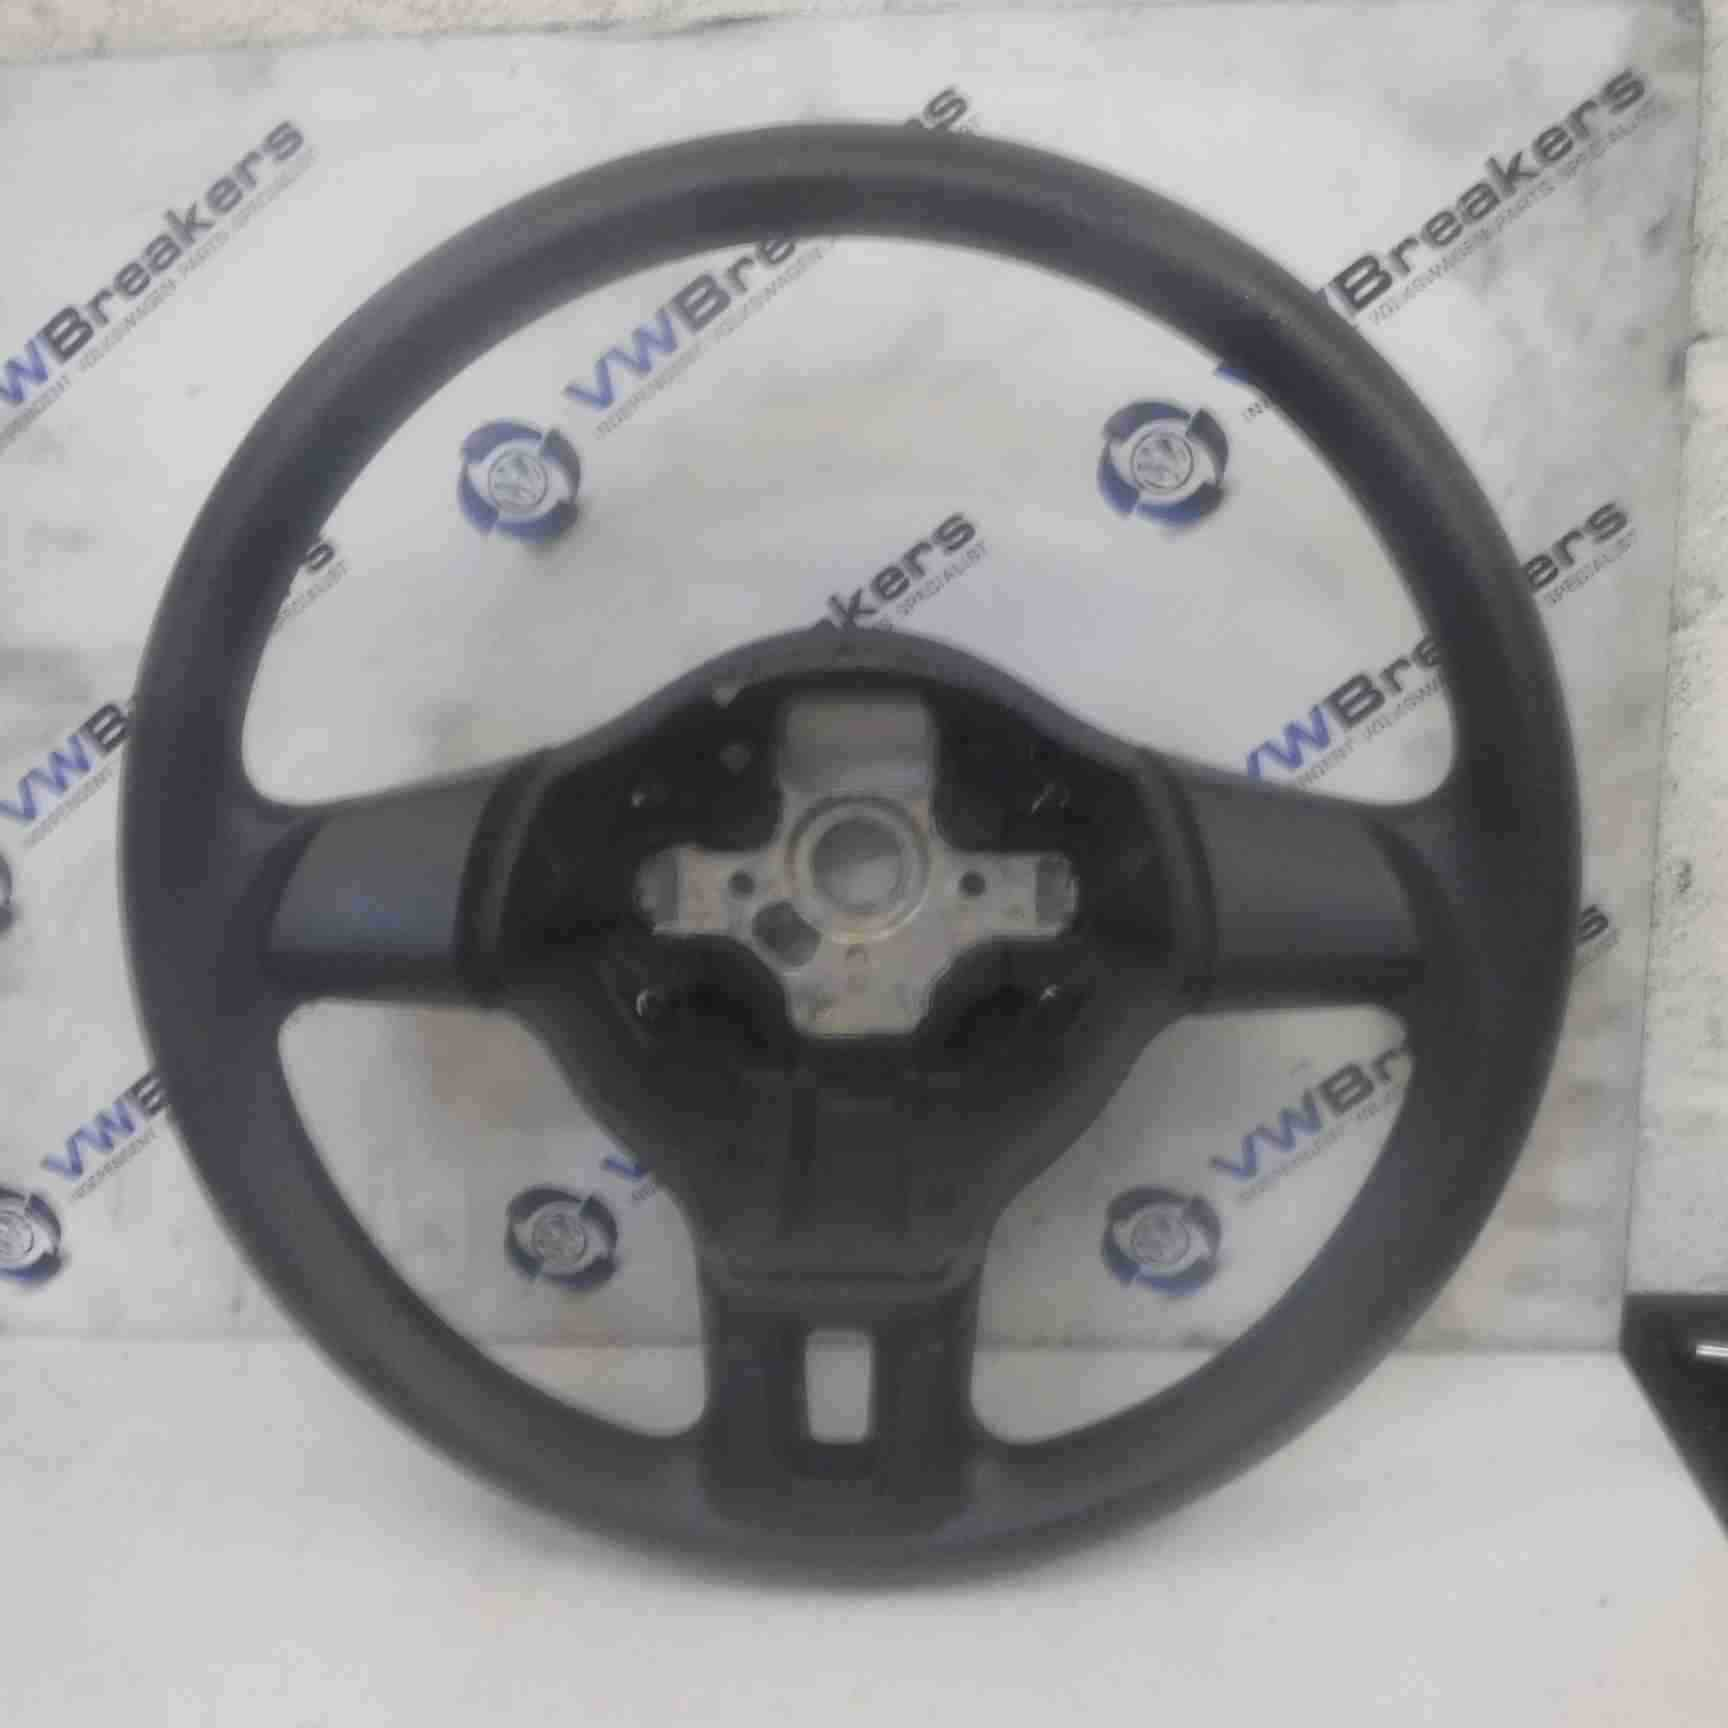 Volkswagen Golf MK6 2009-2012 Leather Steering Wheel 5C0419091 5K0419091H